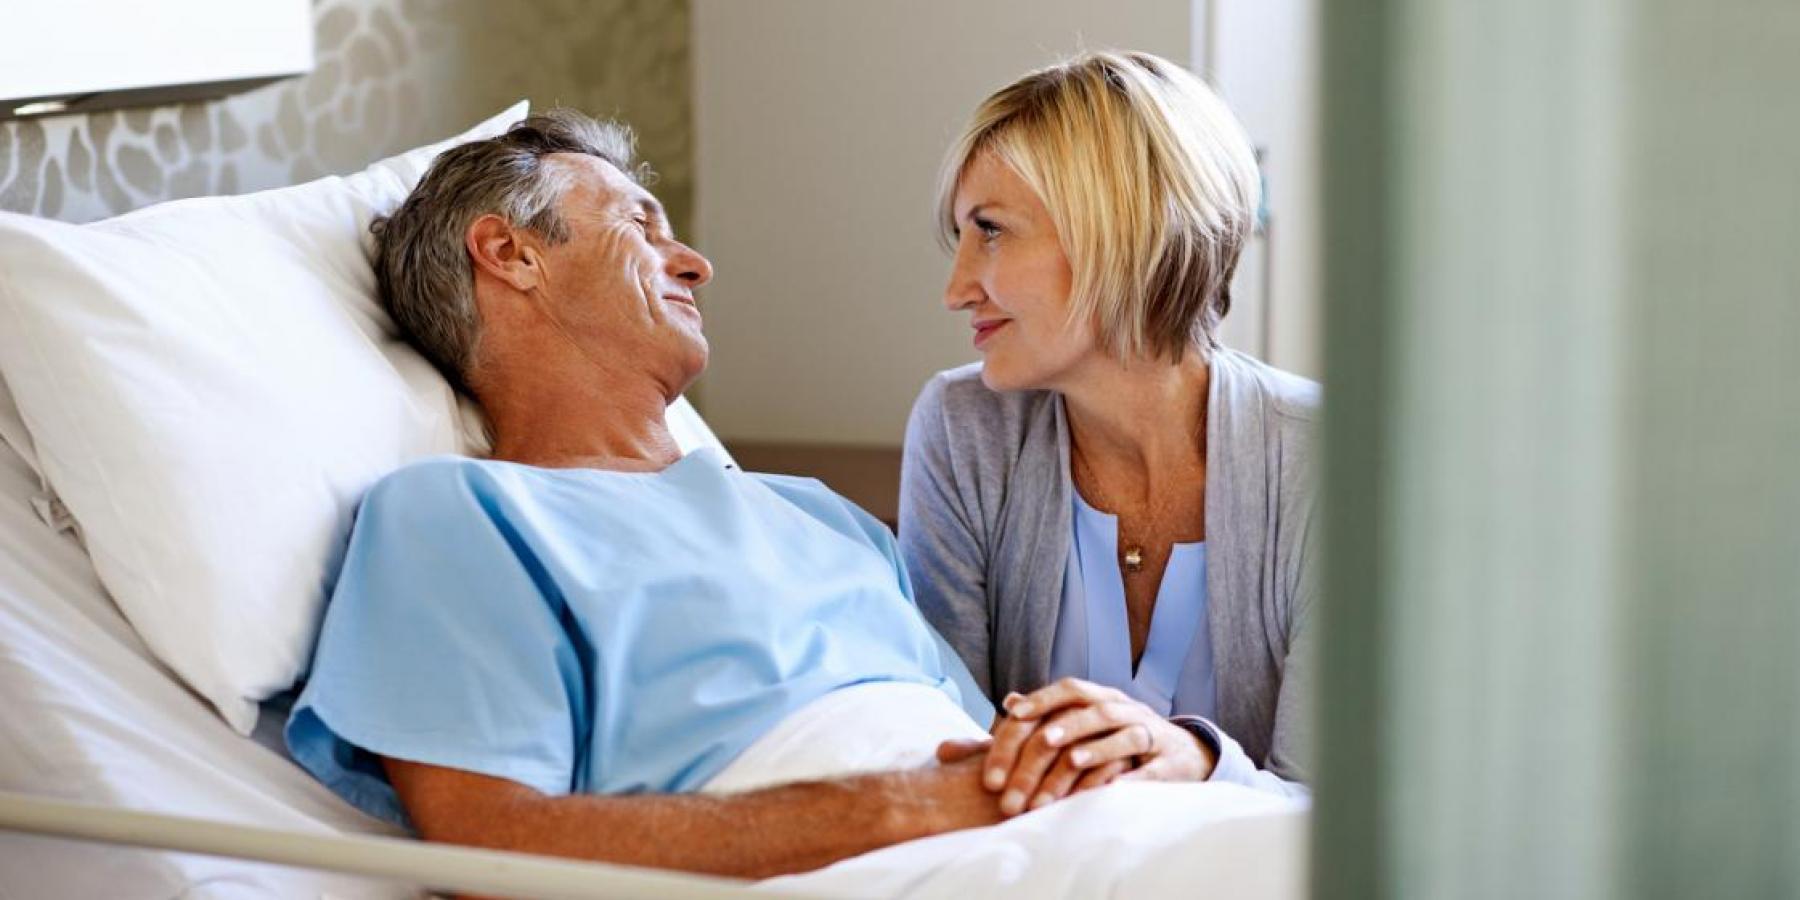 World Stroke Day, 29 October | Couple in hospital © World Stroke Organization